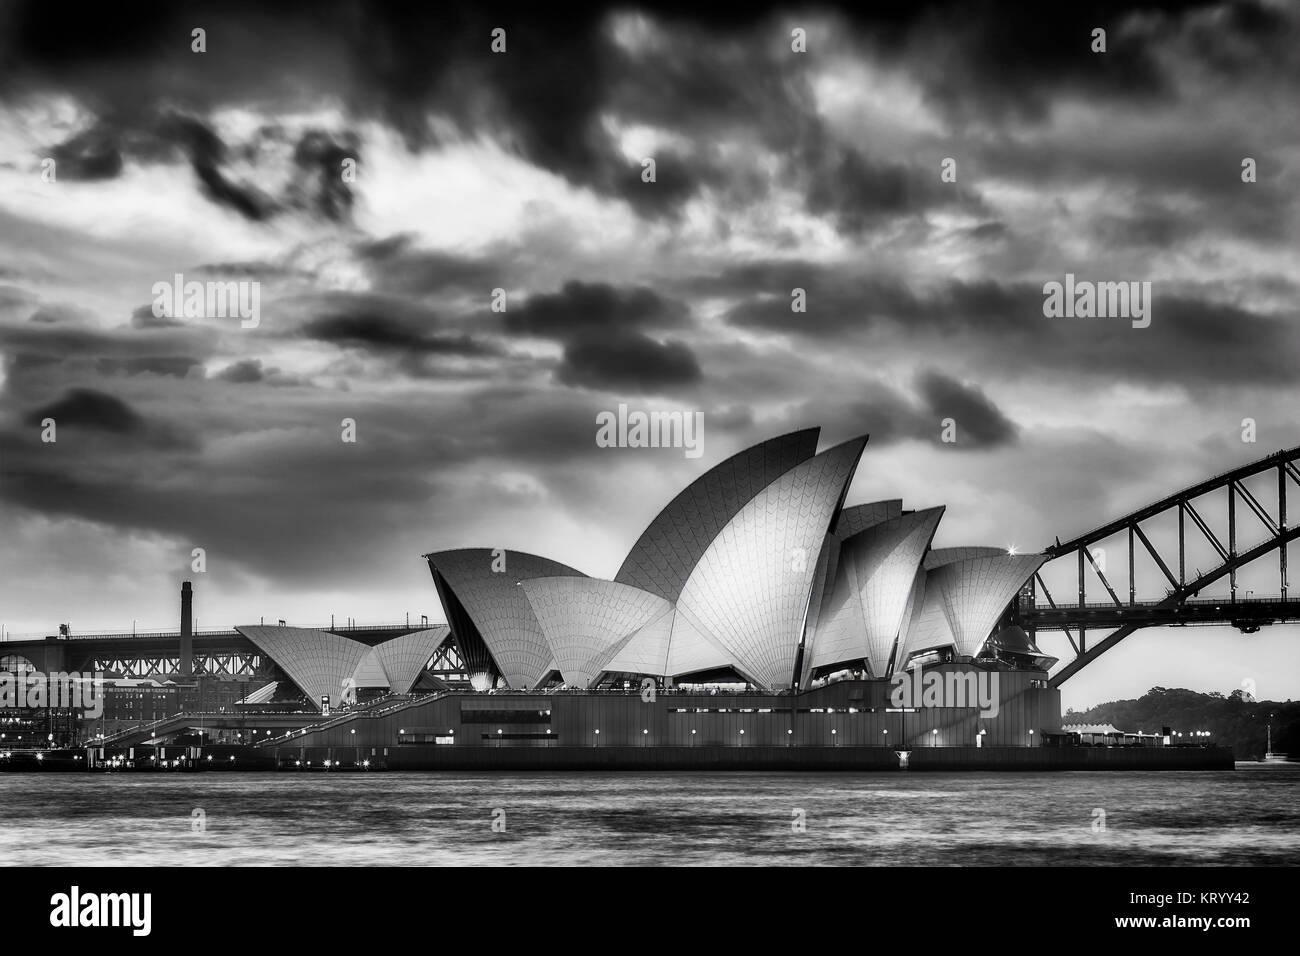 Opera house black and white stock photos images alamy